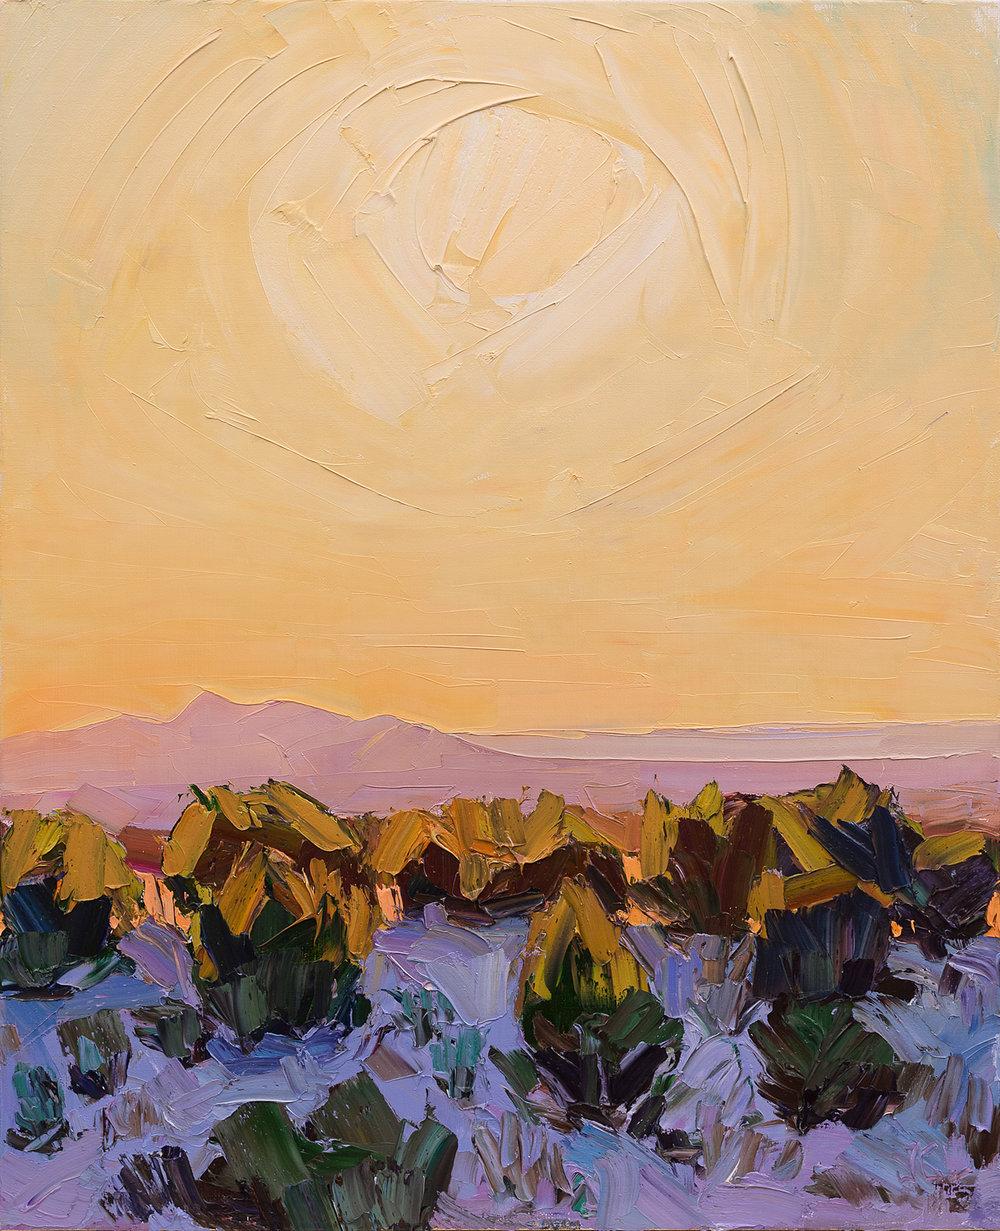 Santa Fe overlook #5 - low sun falling